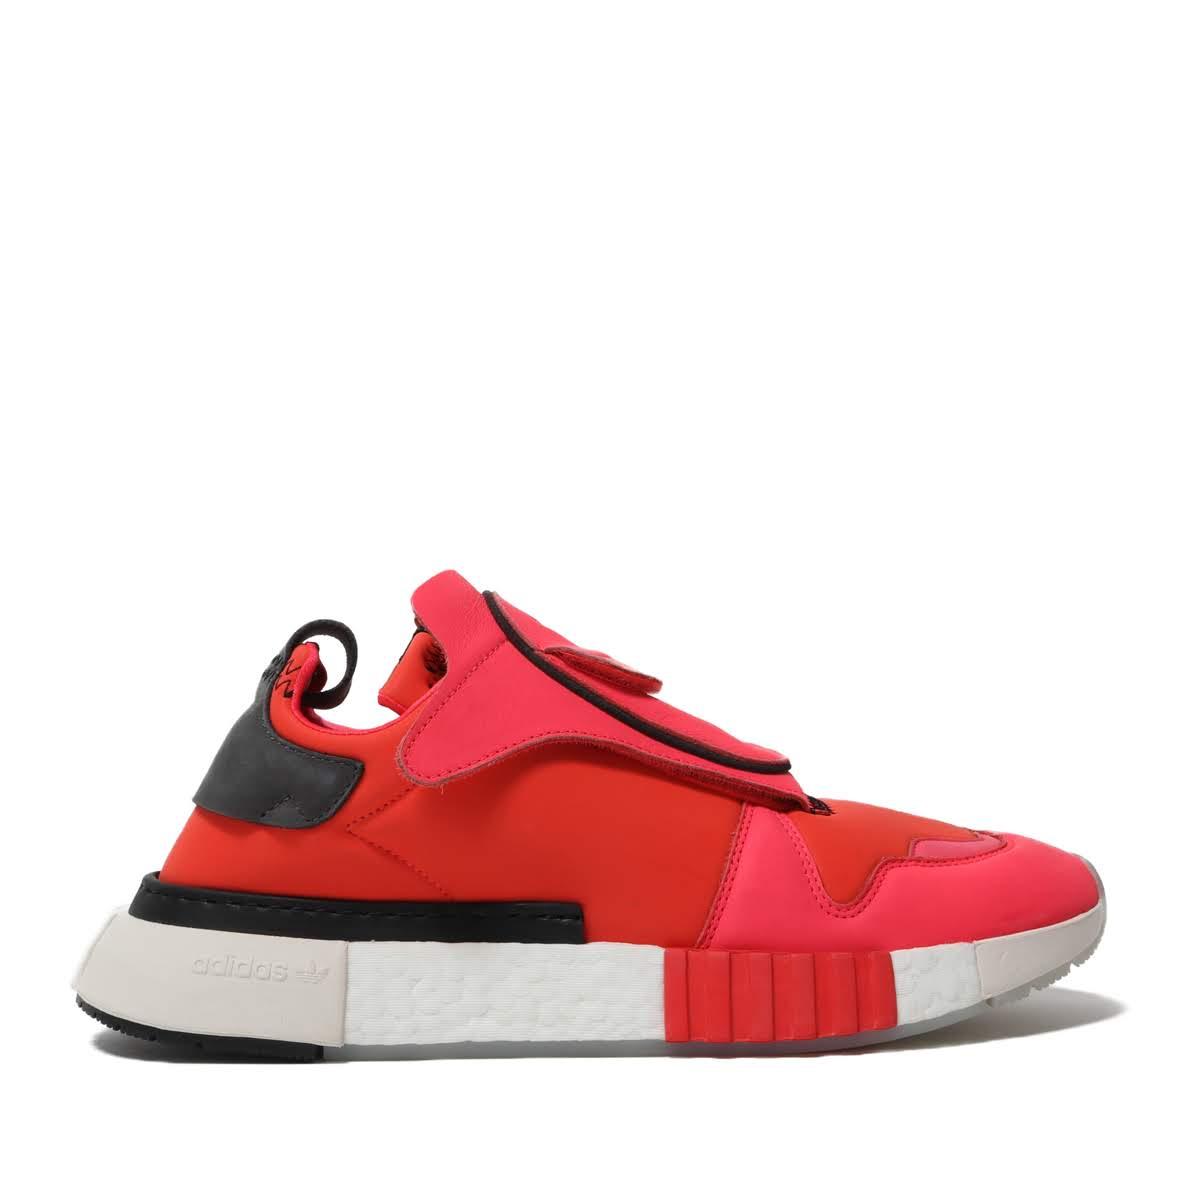 adidas Originals FUTUREPACER(SHOCK RED/SHOCK RED/SHOCK RED)(アディダスオリジナルス フューチャーペーサー)【メンズ】【スニーカー】【19SS-I】